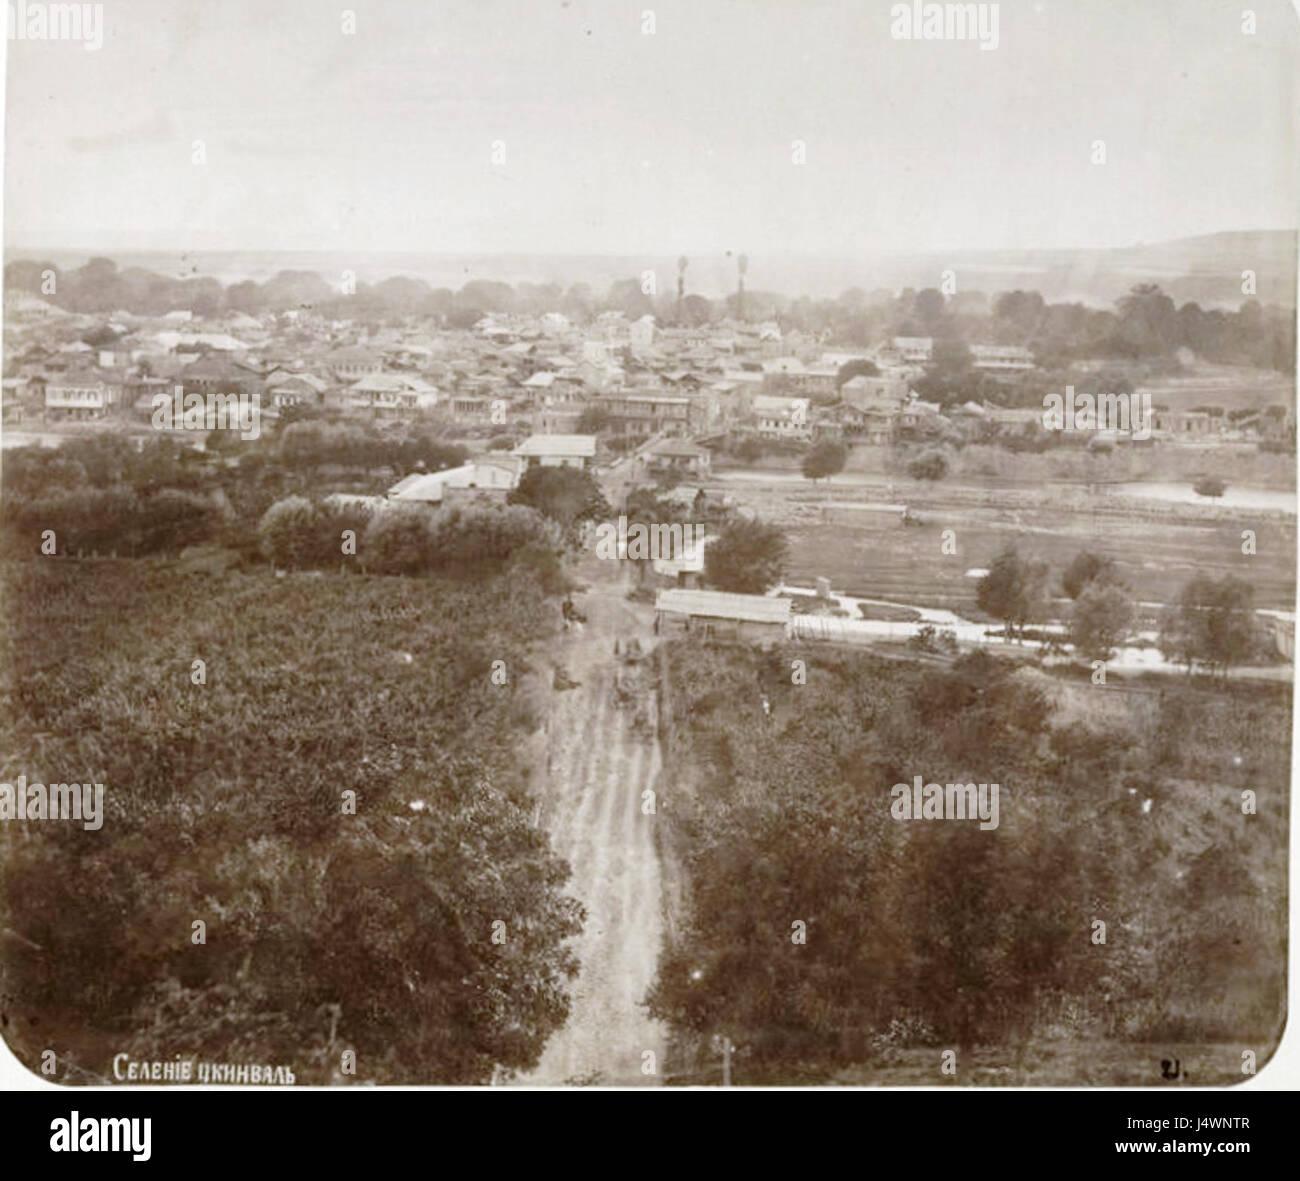 Tskhinvali. Rudnev, D 1886 - Stock Image